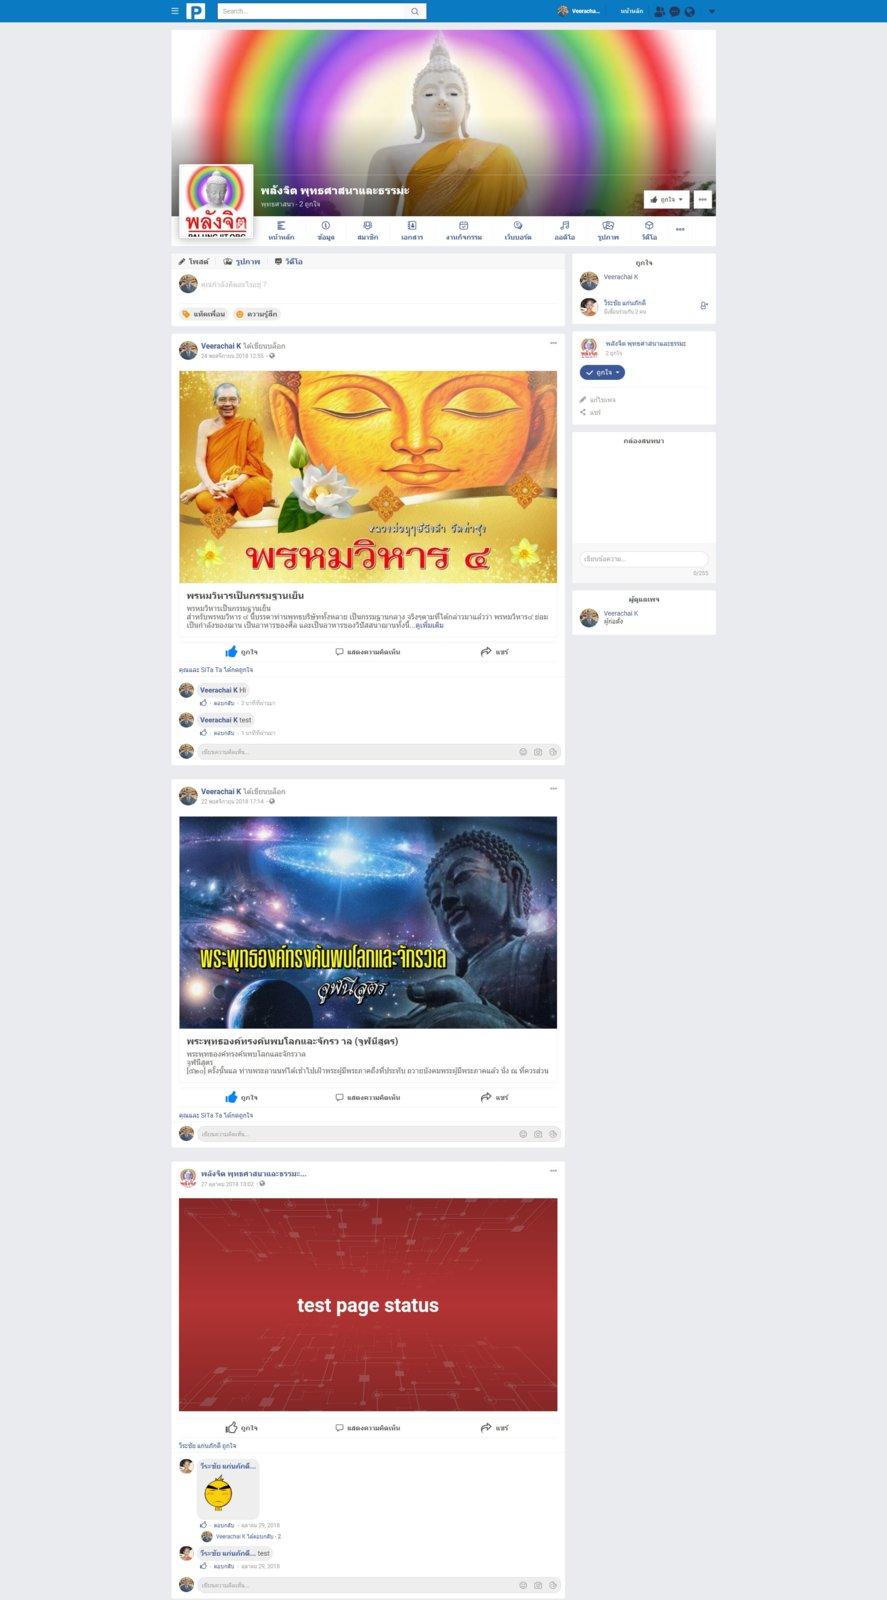 Screenshot_2018-12-25 พลังจิต พุทธศาสนาและธรรมะ.jpg